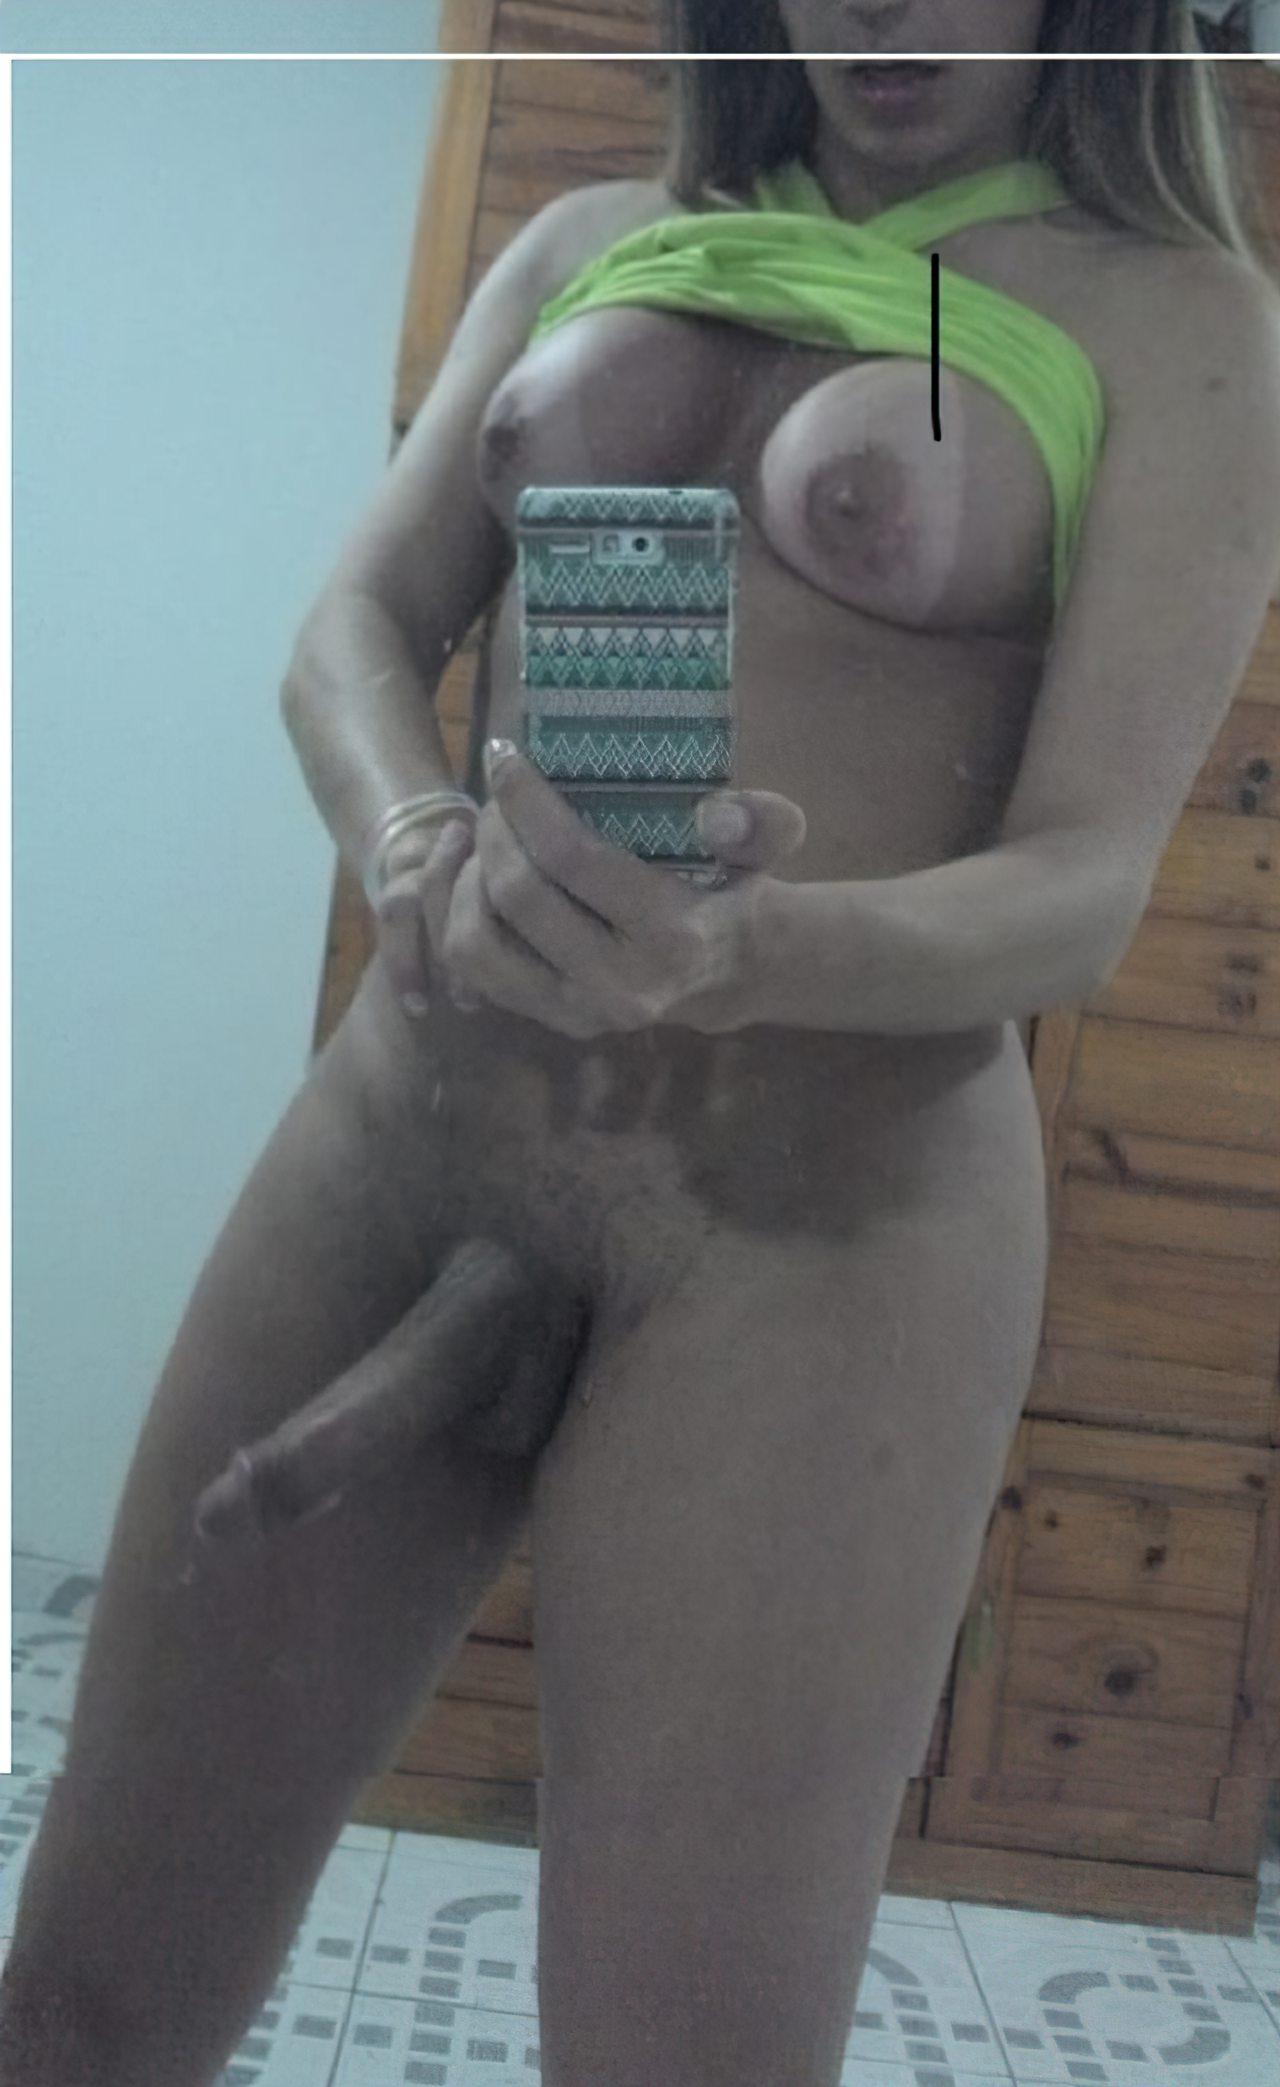 Fotos Amadoras de Travesti Brasileira (3)